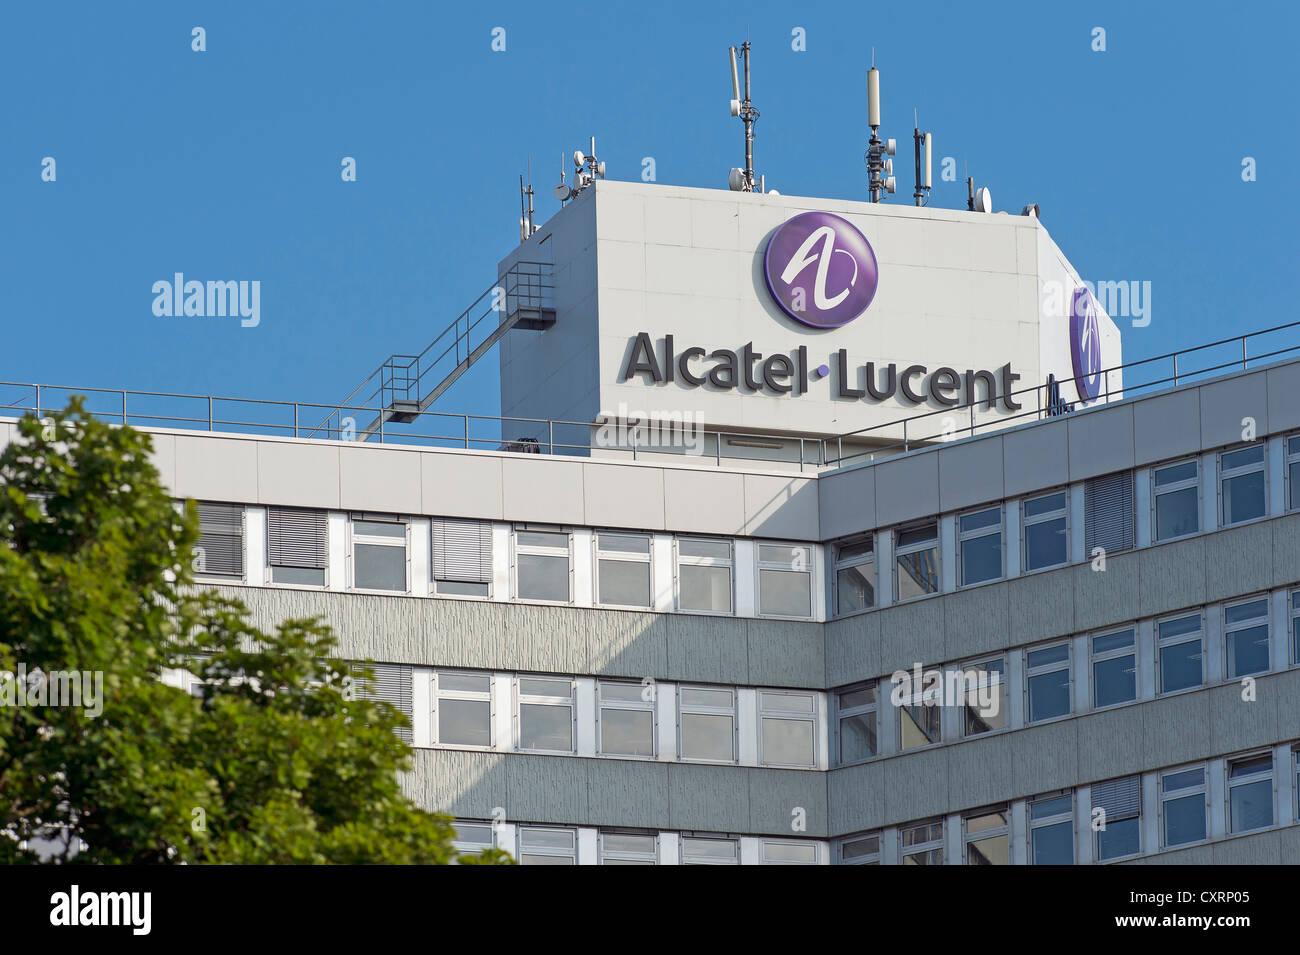 Alcatel-Lucent company headquarters, Stuttgart-Zuffenhausen, Baden-Wuerttemberg, Germany, Europe - Stock Image